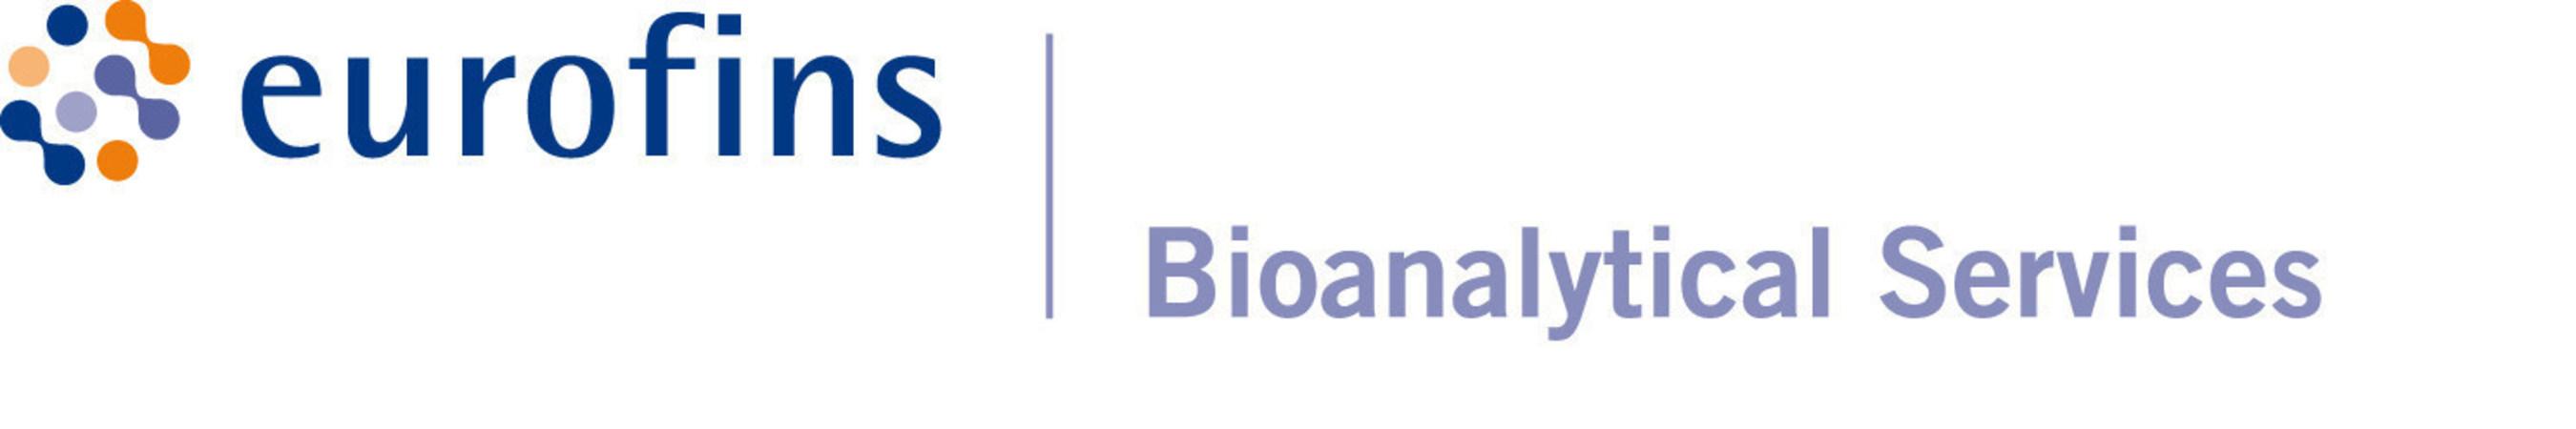 Eurofins Pharma Bioanalytics Services US